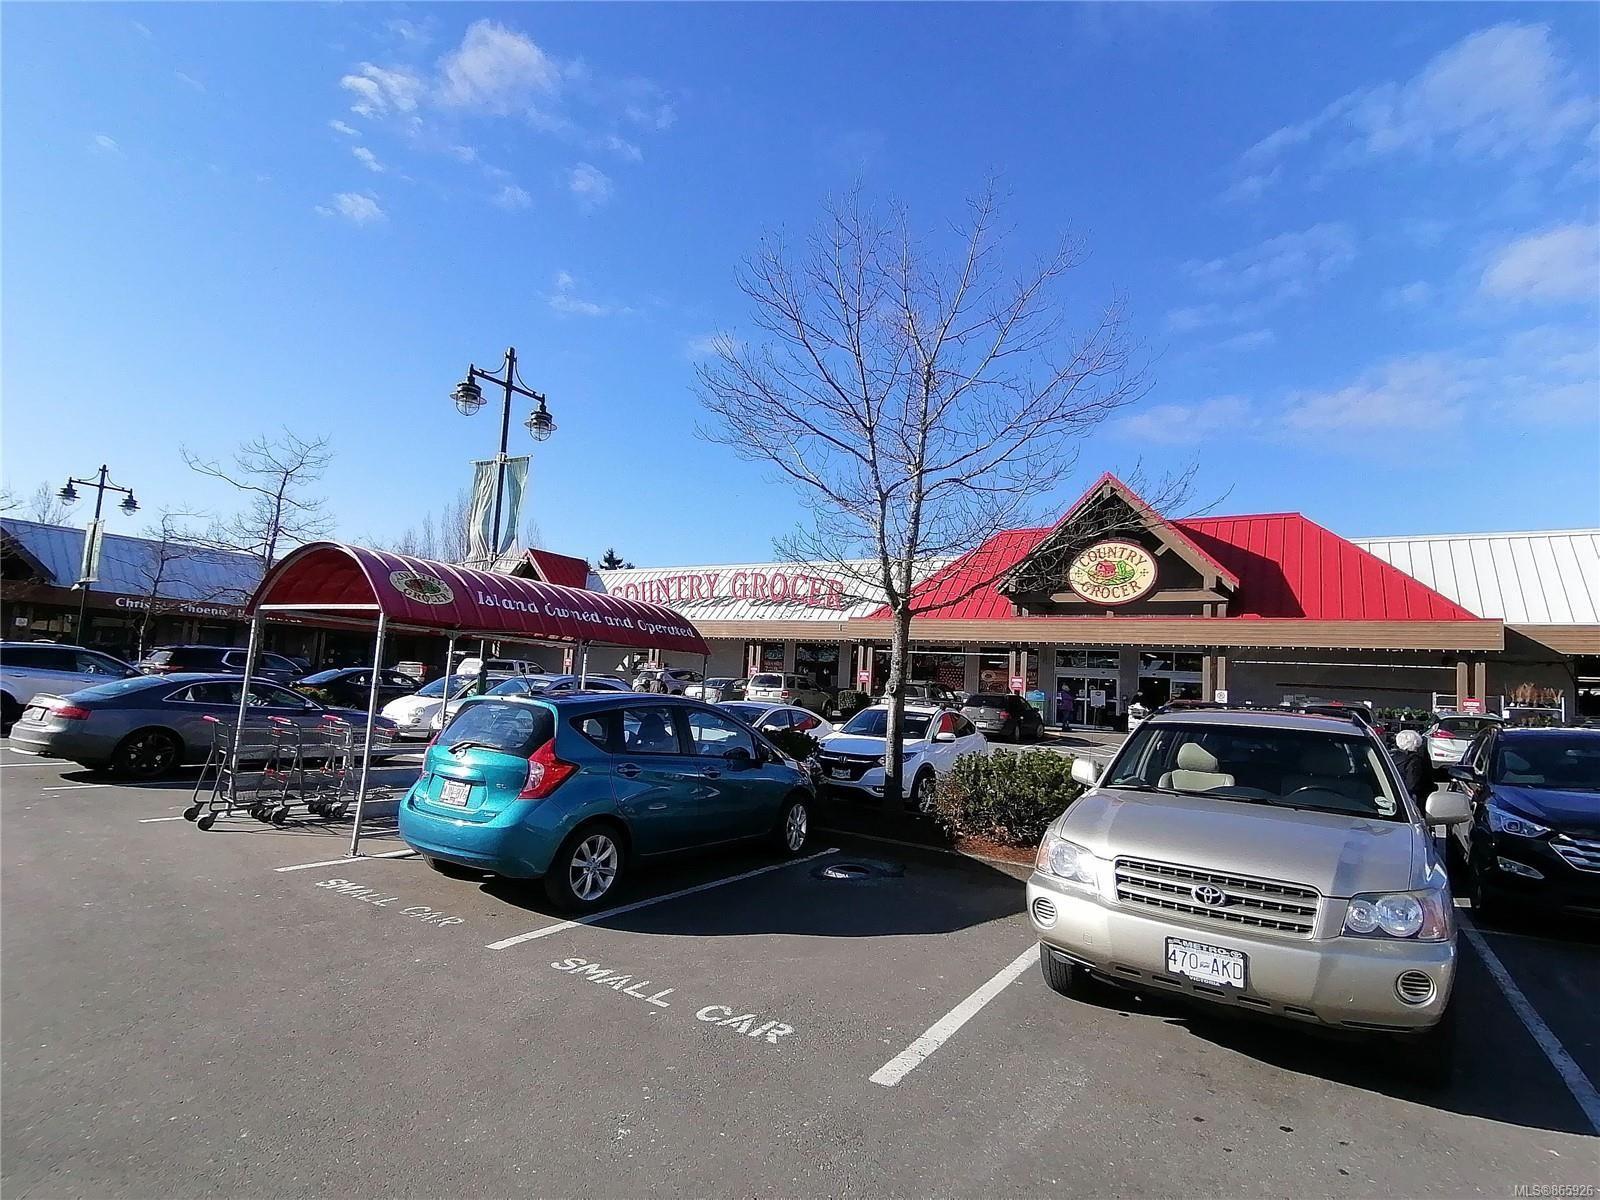 Photo 27: Photos: 8 4350 West Saanich Rd in : SW Royal Oak Row/Townhouse for sale (Saanich West)  : MLS®# 865926